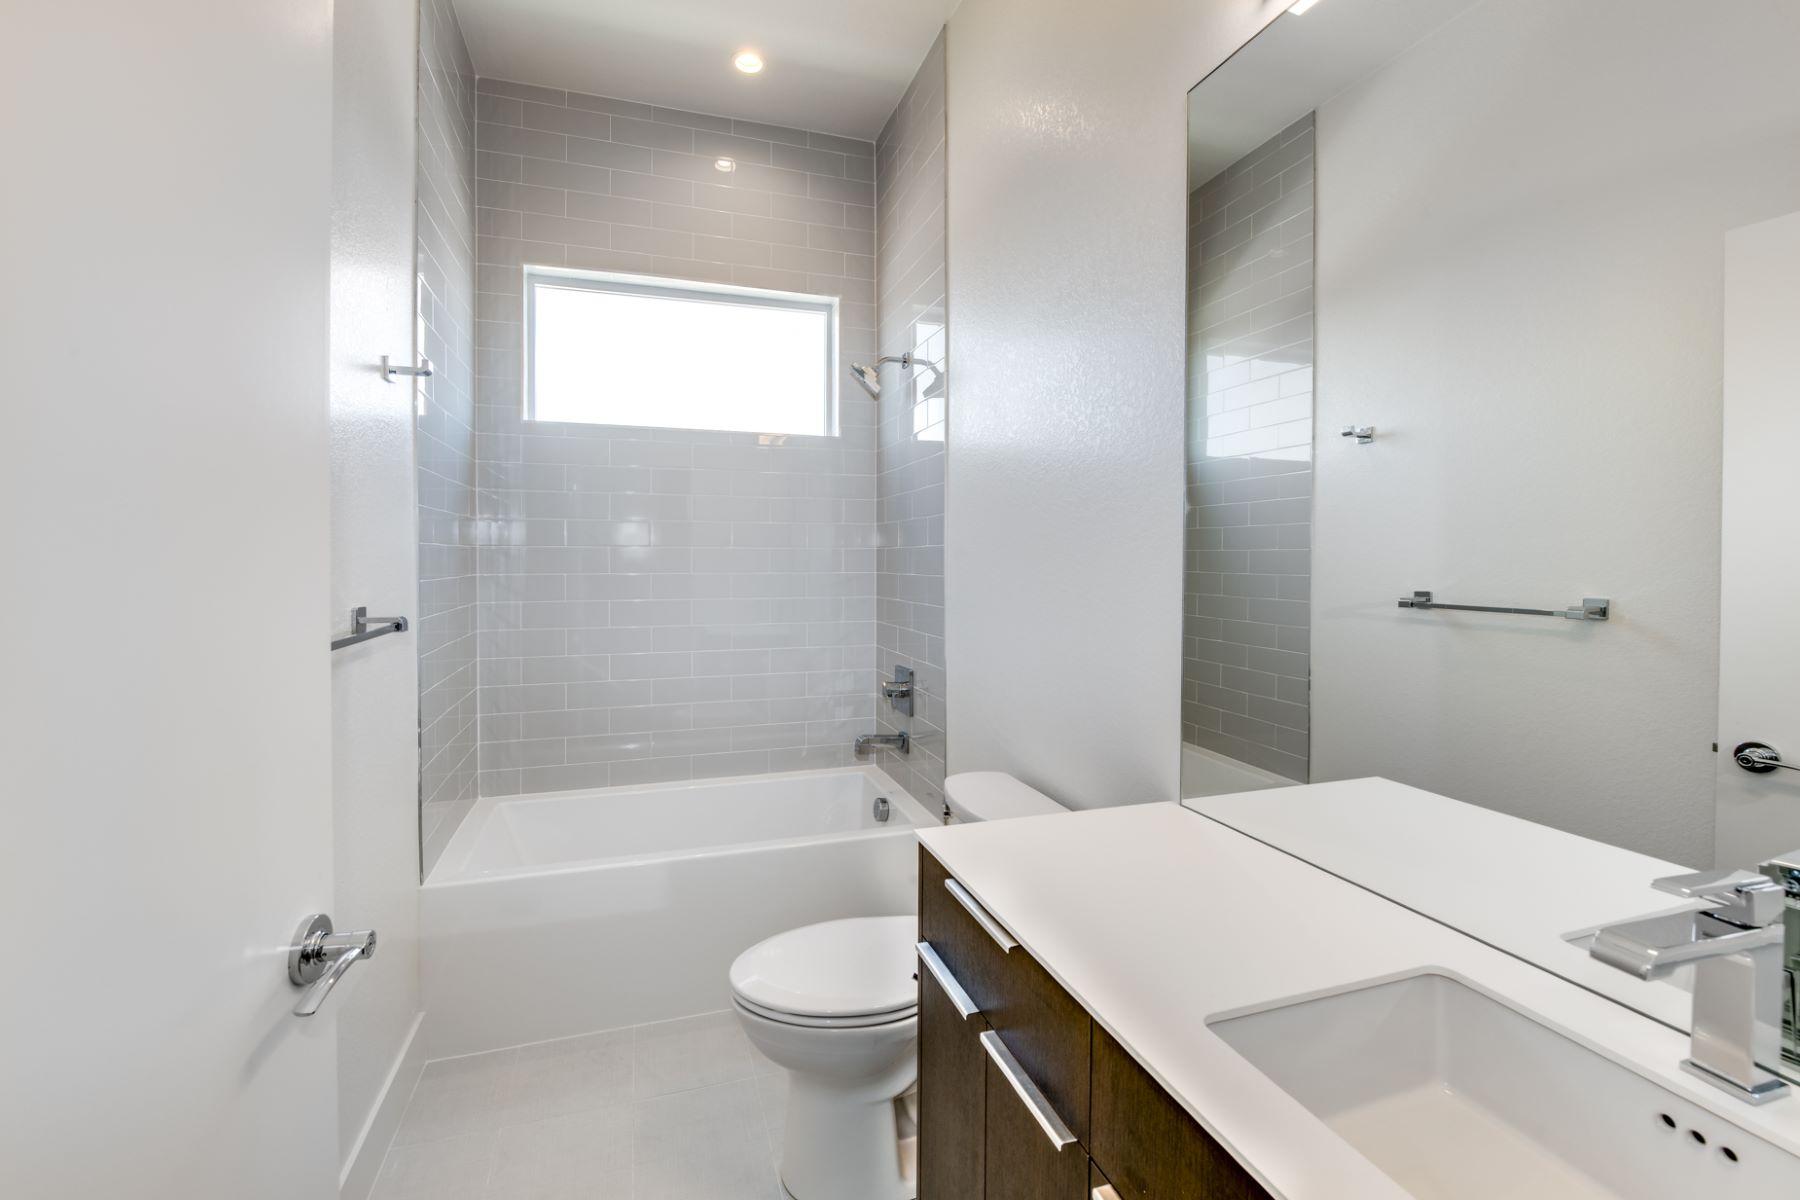 Additional photo for property listing at 4395 Zuni Street 4395 Zuni St Denver, Colorado 80211 United States